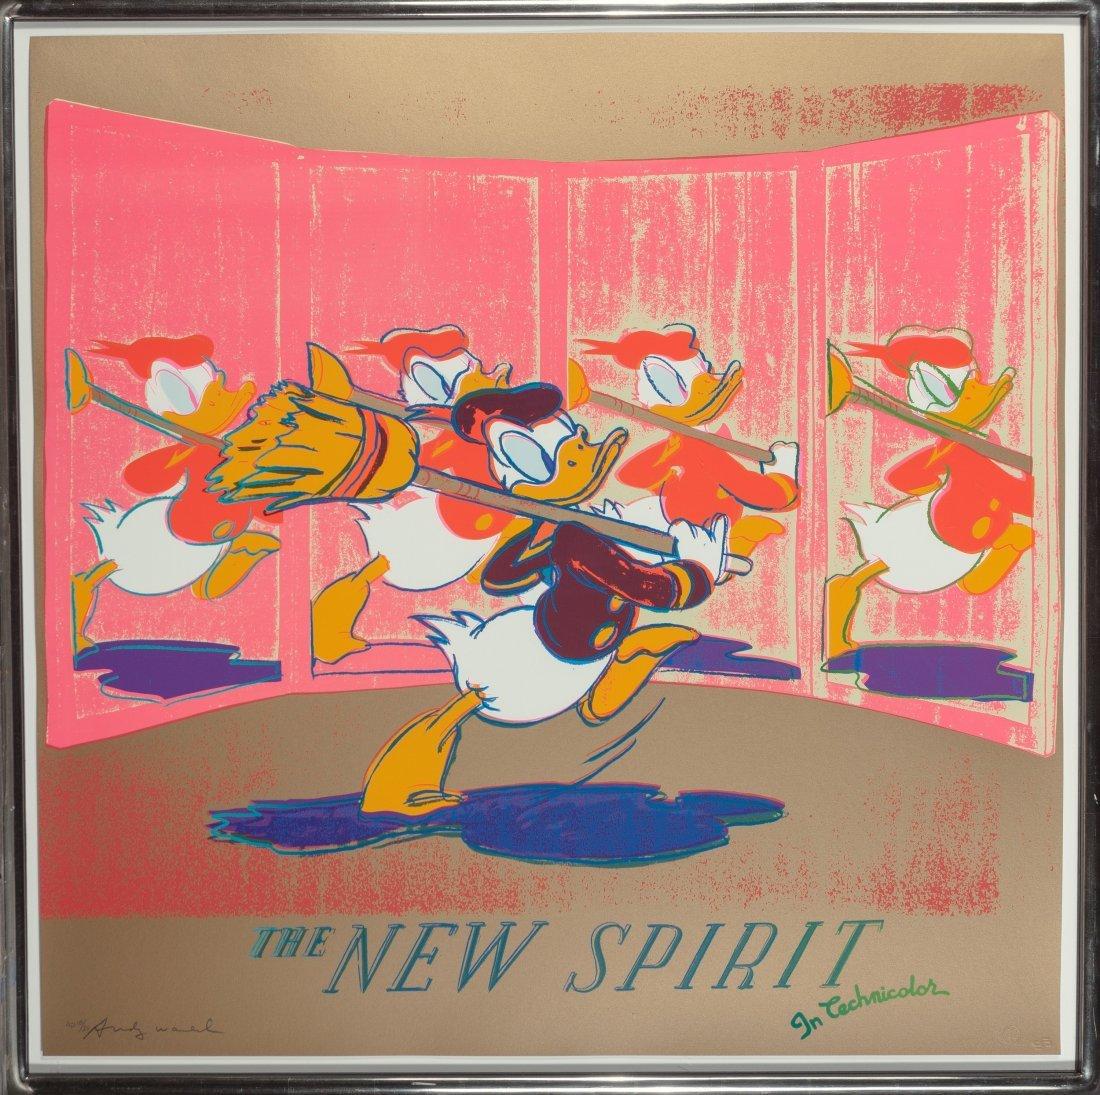 77211: Andy Warhol (1928-1987) The New Spirit (Donald D - 3